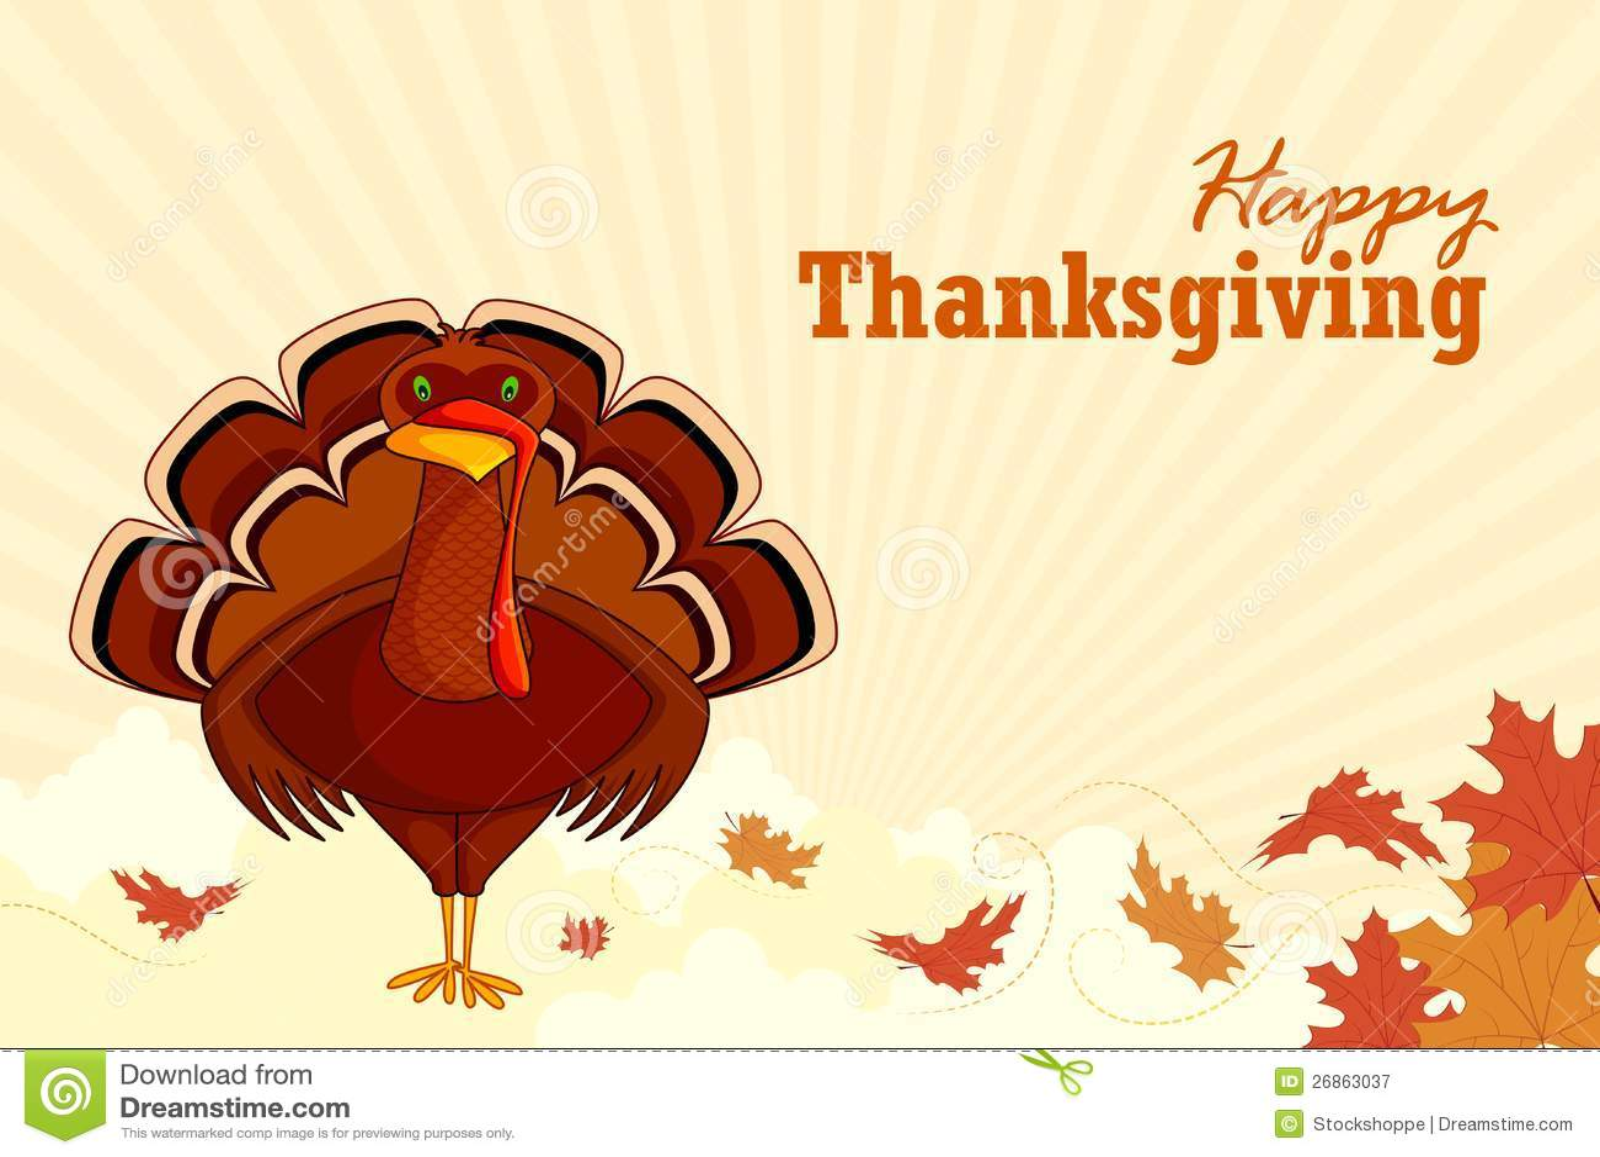 Turkey wishing happy thanksgiving royalty free stock photography